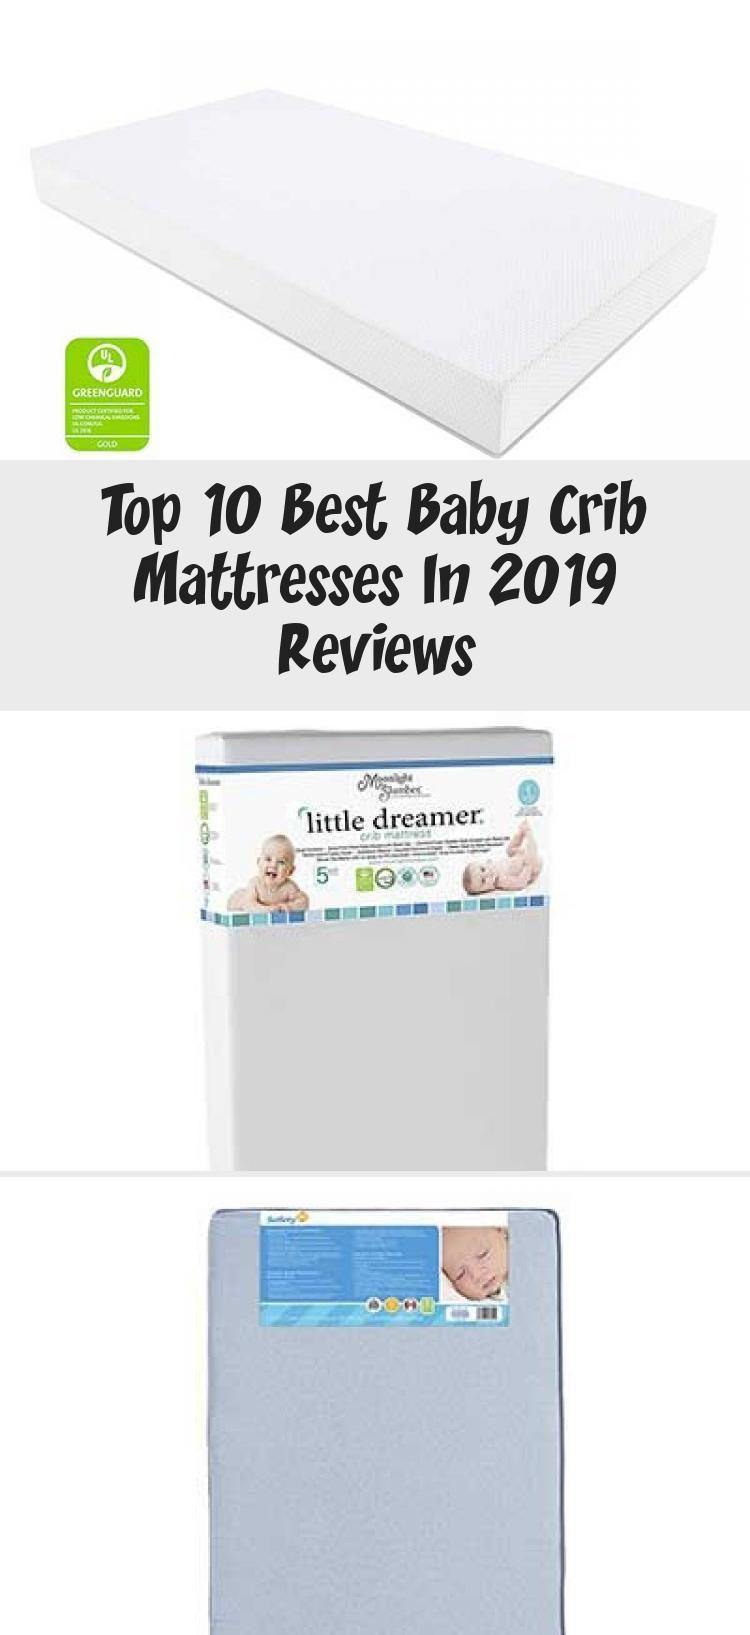 Moonlight Slumber Little Dreamer Dual Sleep Surface Crib Mattress Mattressquotes Mattressdesign Mattresscleane In 2020 Best Baby Cribs Baby Crib Mattress Baby Cribs